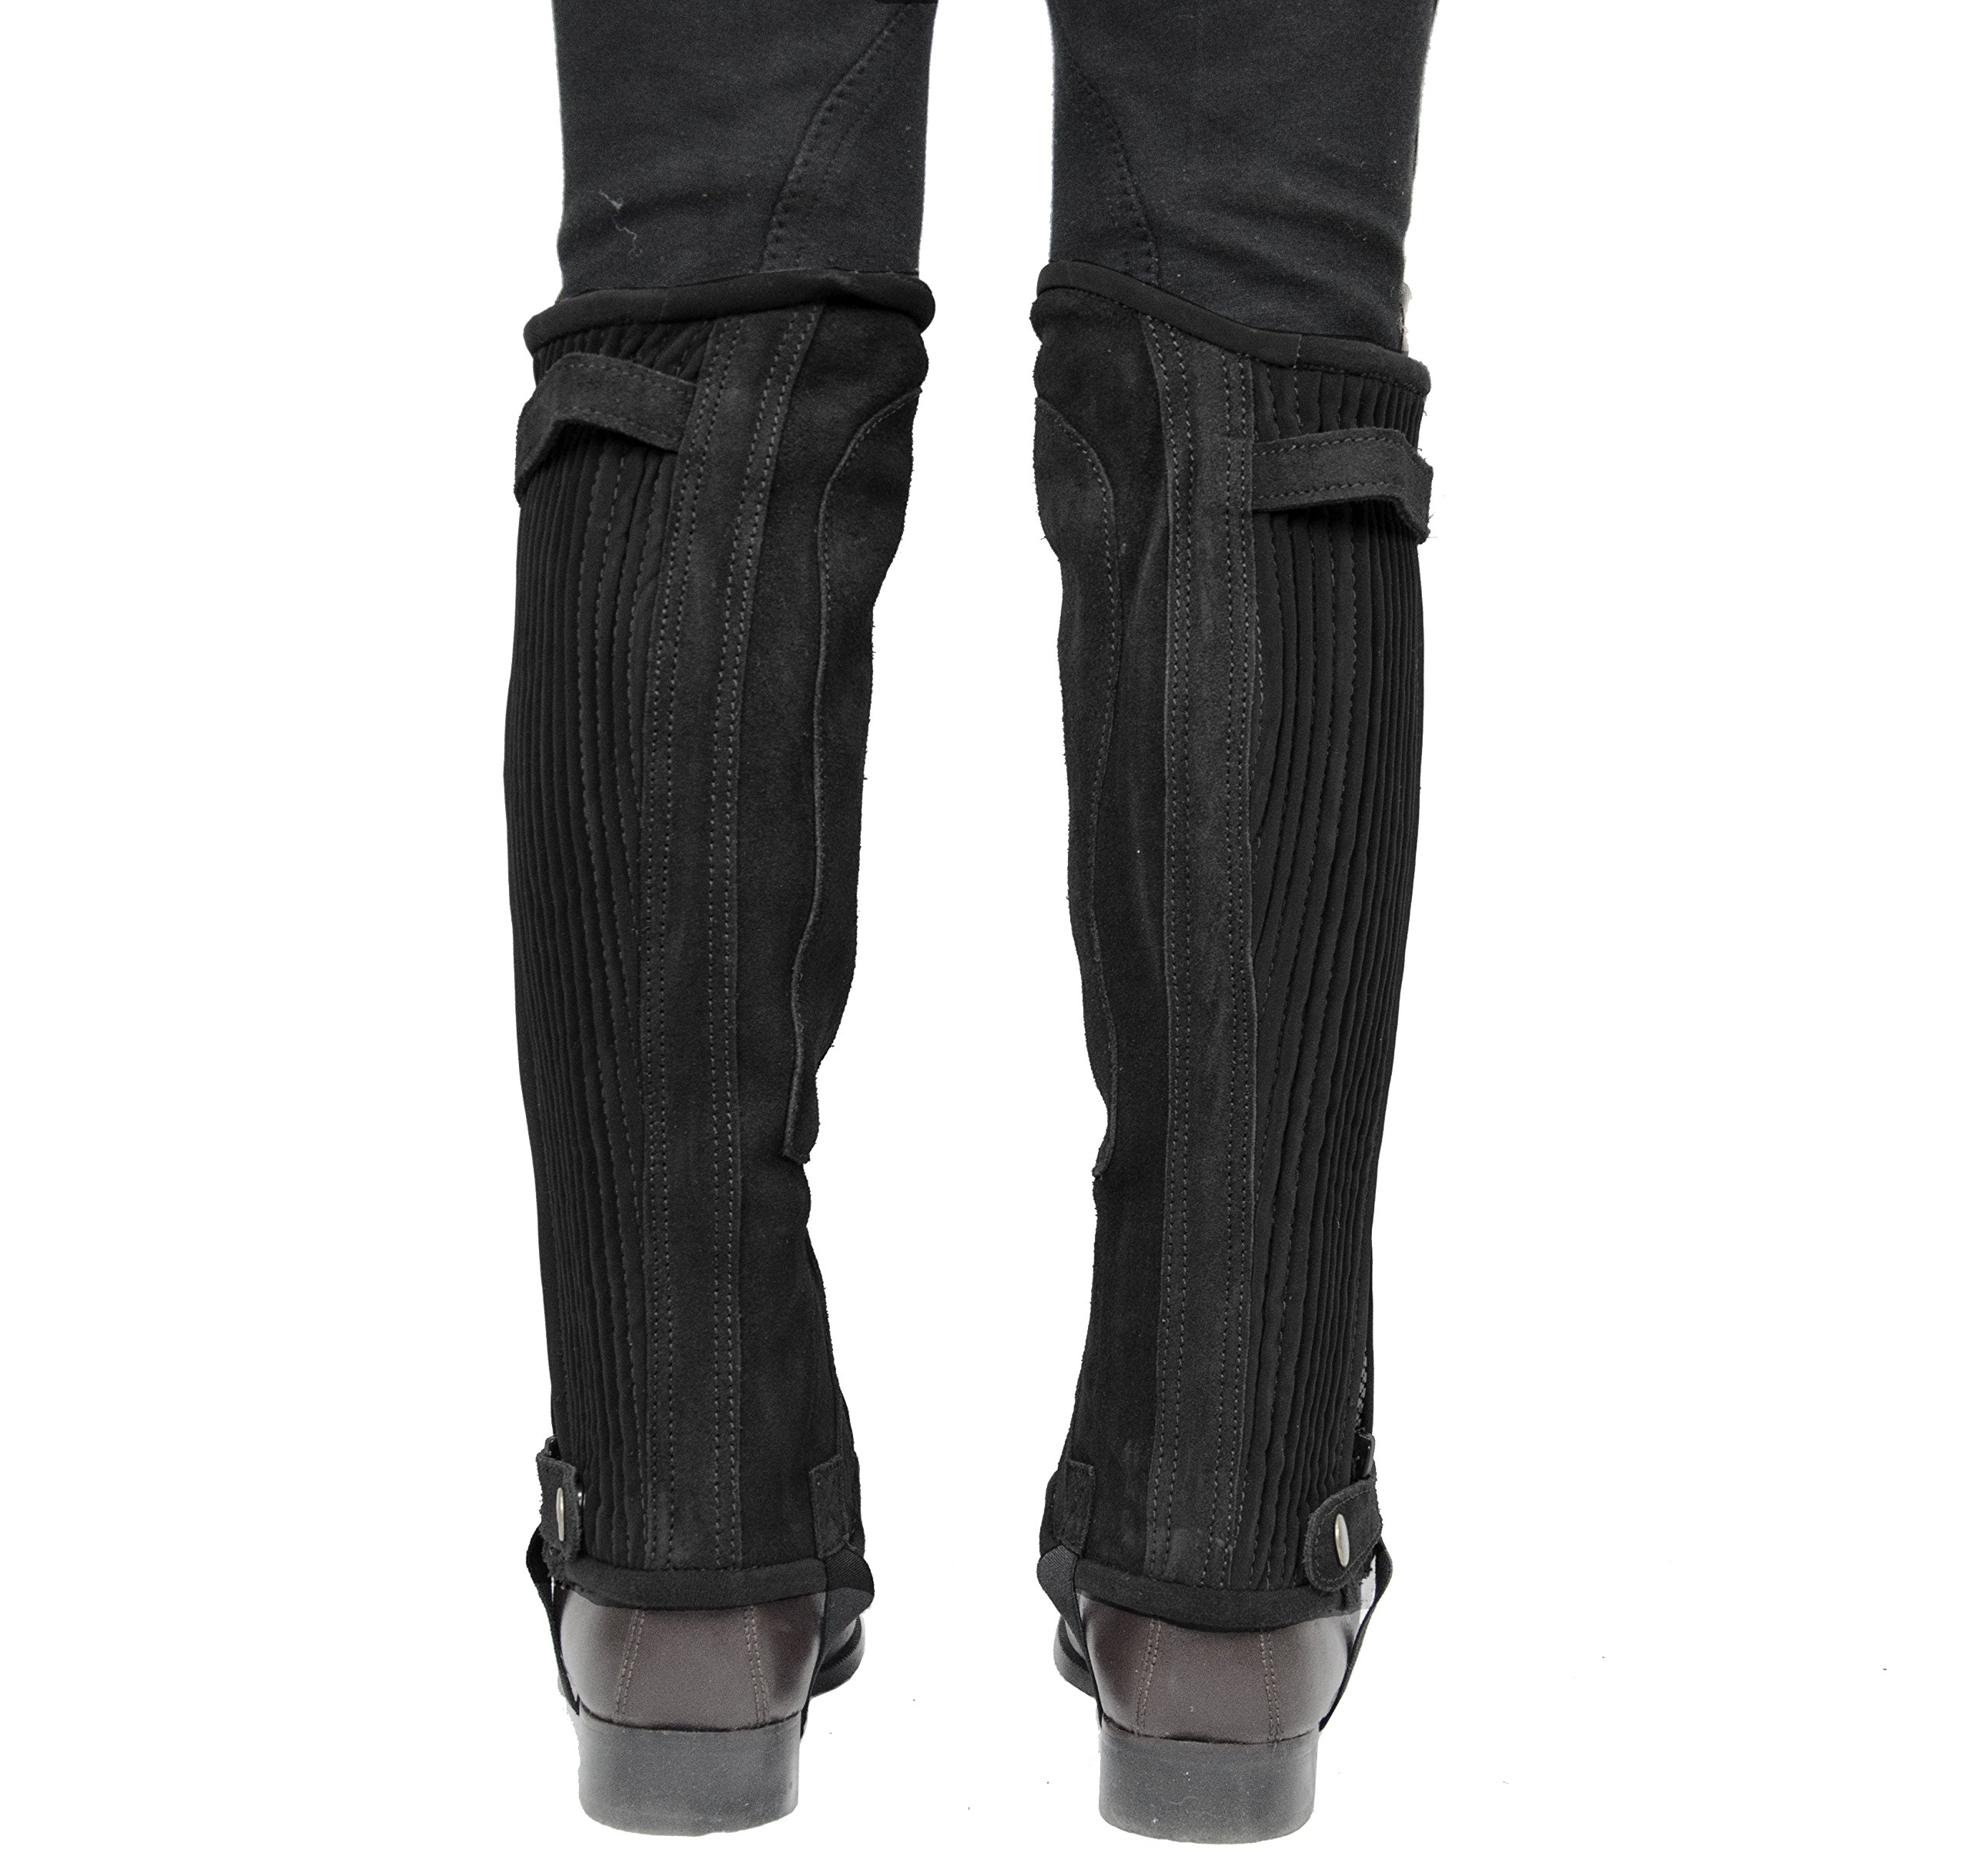 Derby Originals Kids Suede Leather Half Chaps Elastic & Zipper, Black, X-Small